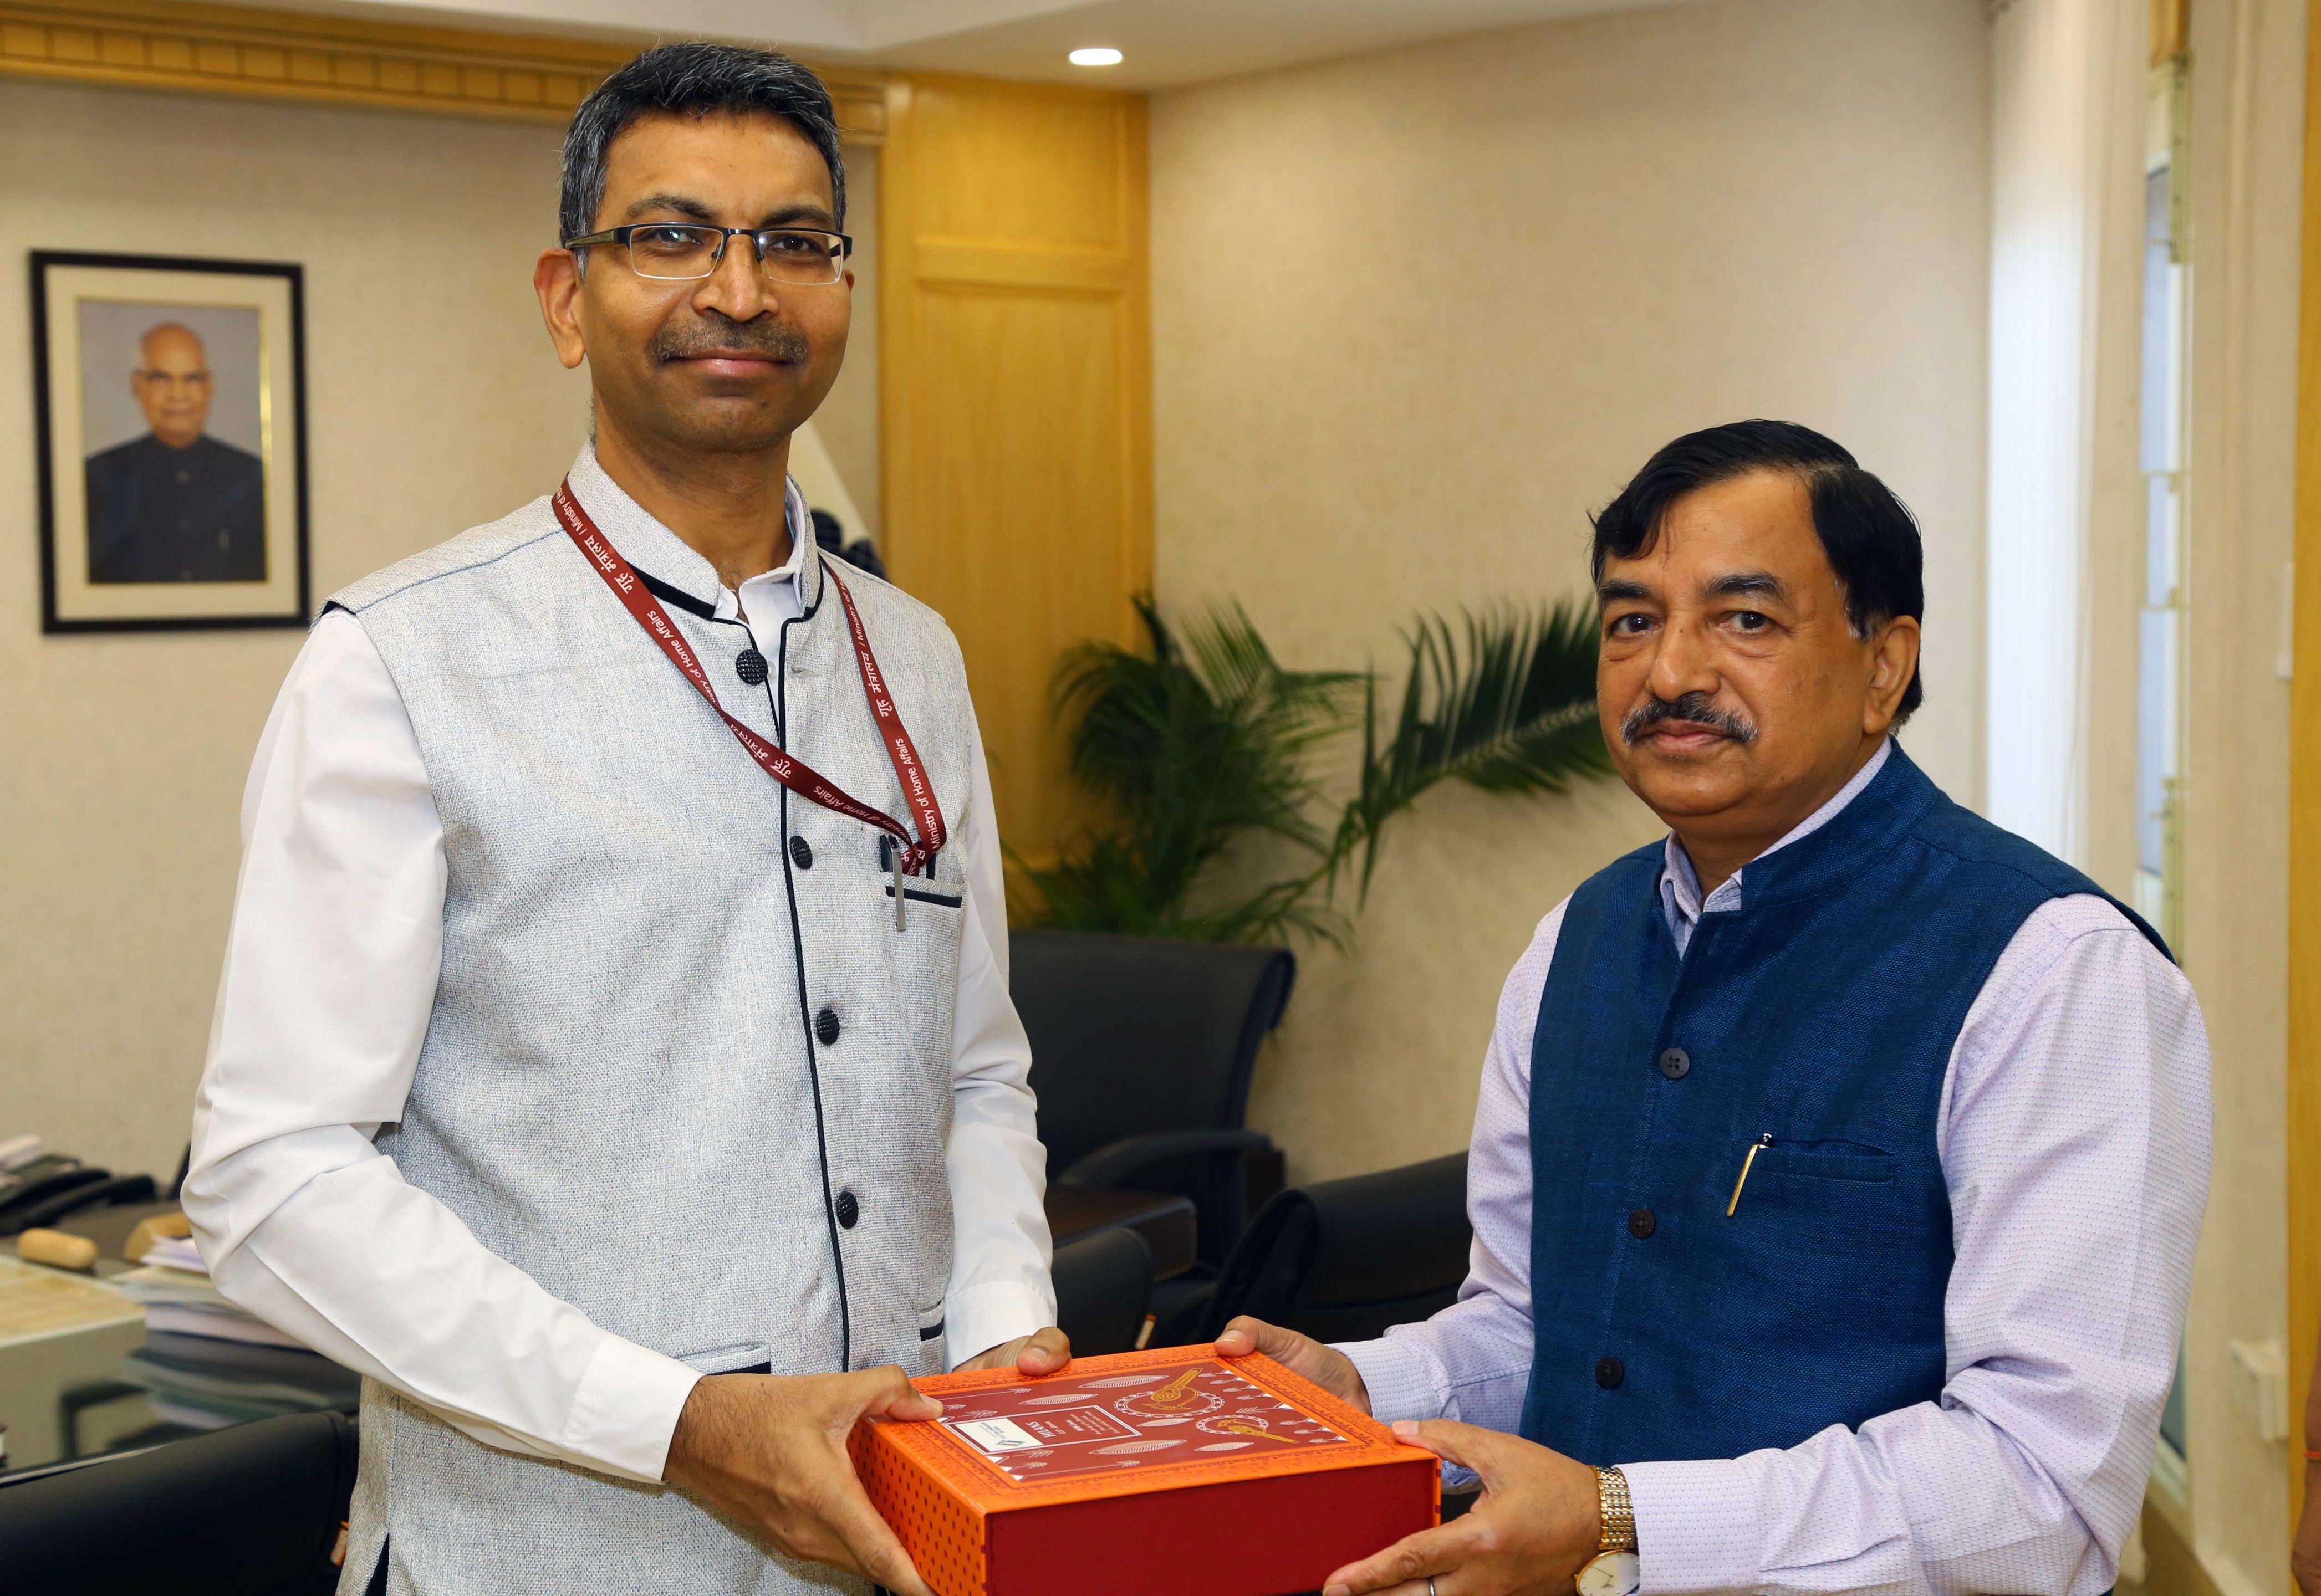 Mr. Prashant Pise, Ambassador of India-designate to Iraq met Mr. Sushil Chandra, Chief Election Commissioner of India on 22nd July, 2021 in Nirvachan Sadan, New Delhi.